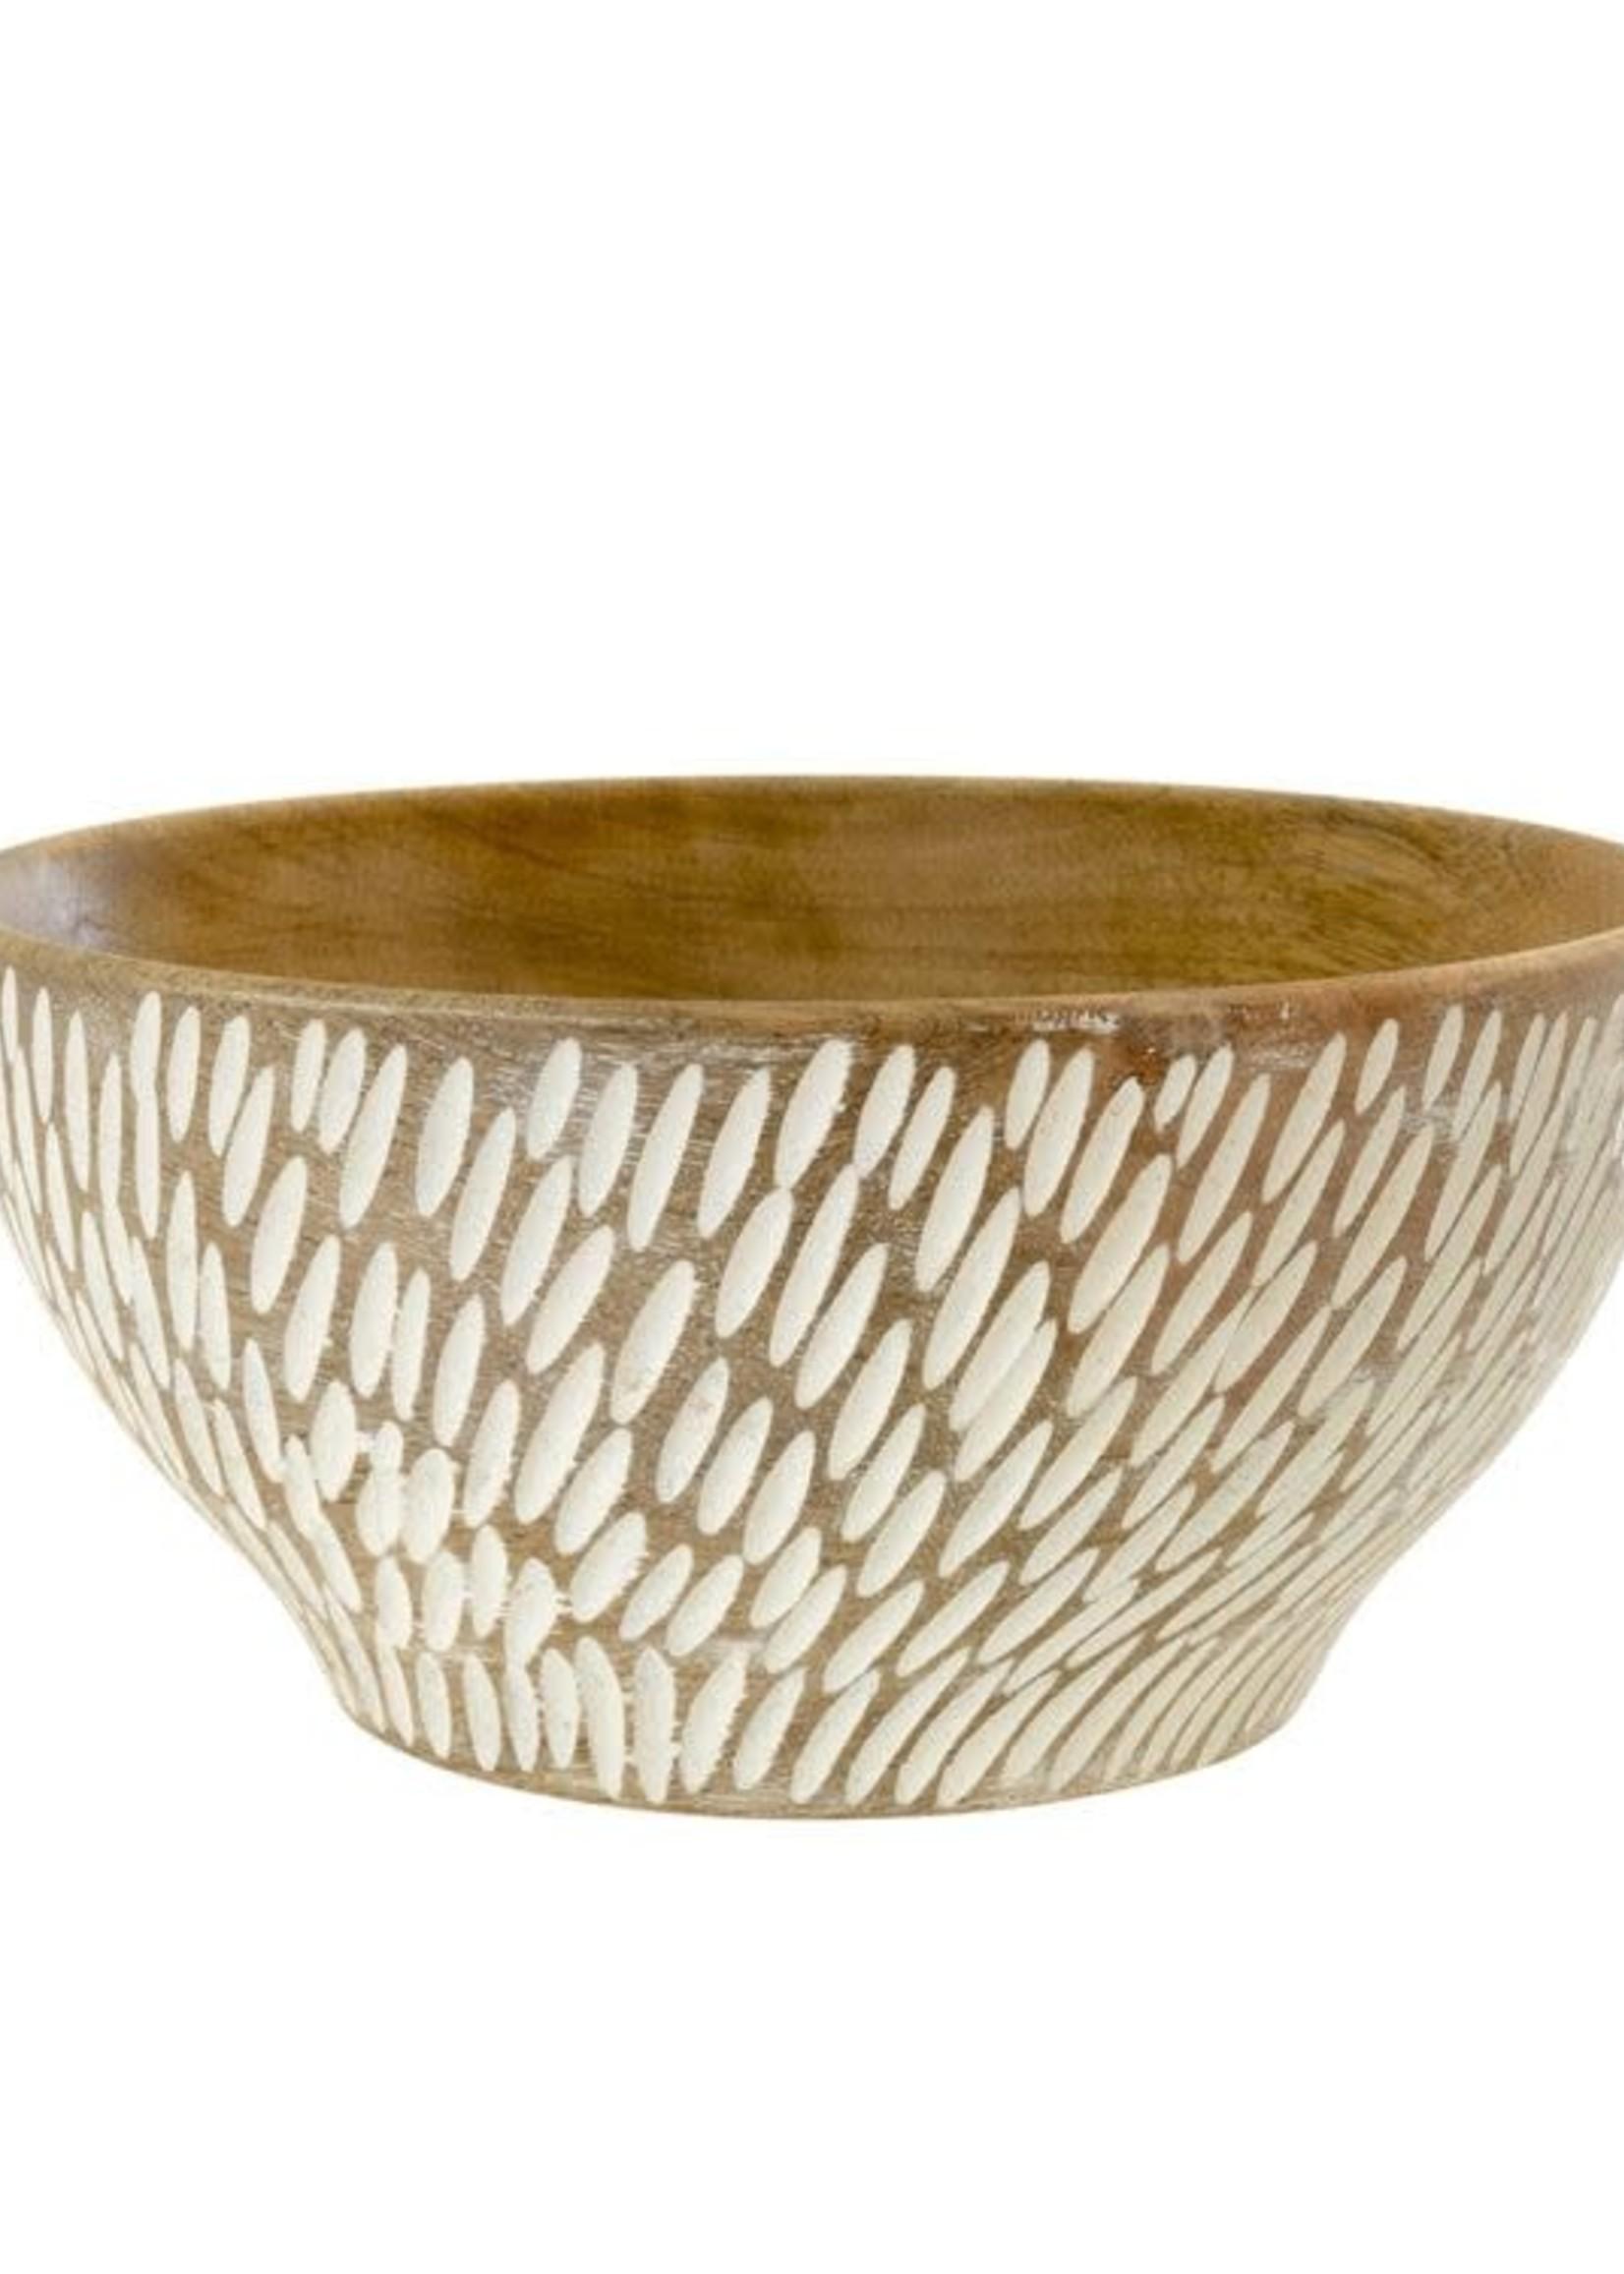 Semilla Wooden Bowl, Small